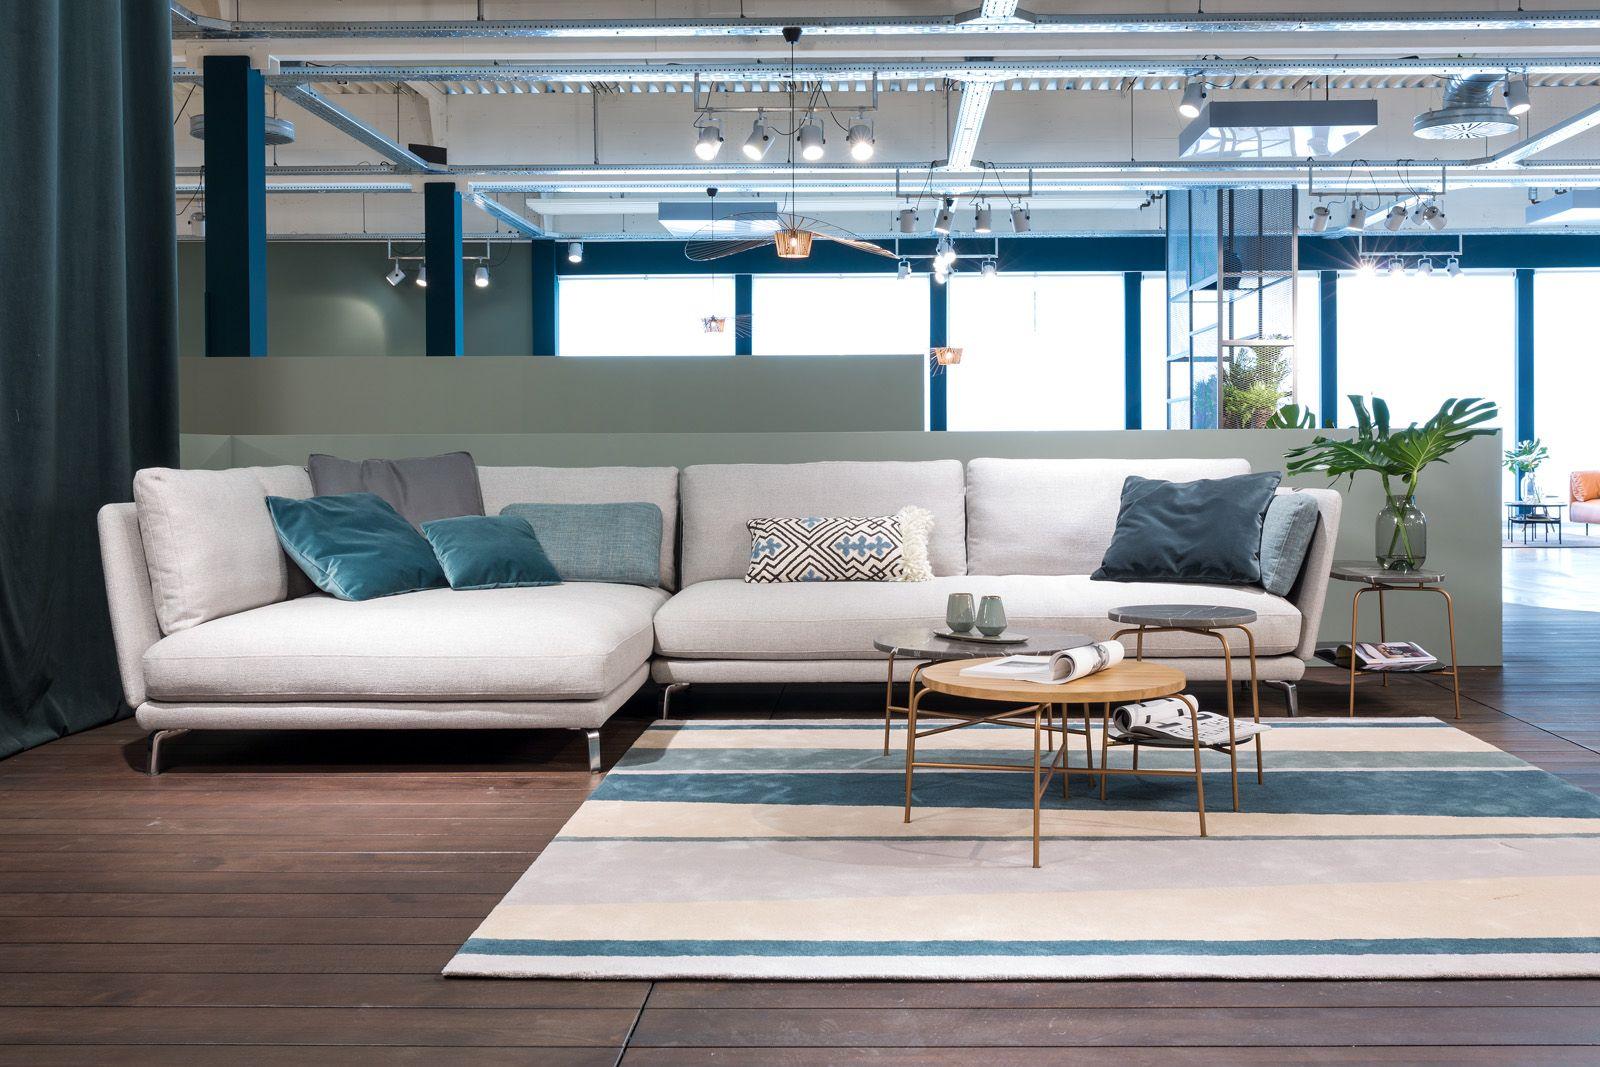 Awe Inspiring Rolf Benz Rondo Brand New Sofa Line From Rolf Benz Alphanode Cool Chair Designs And Ideas Alphanodeonline